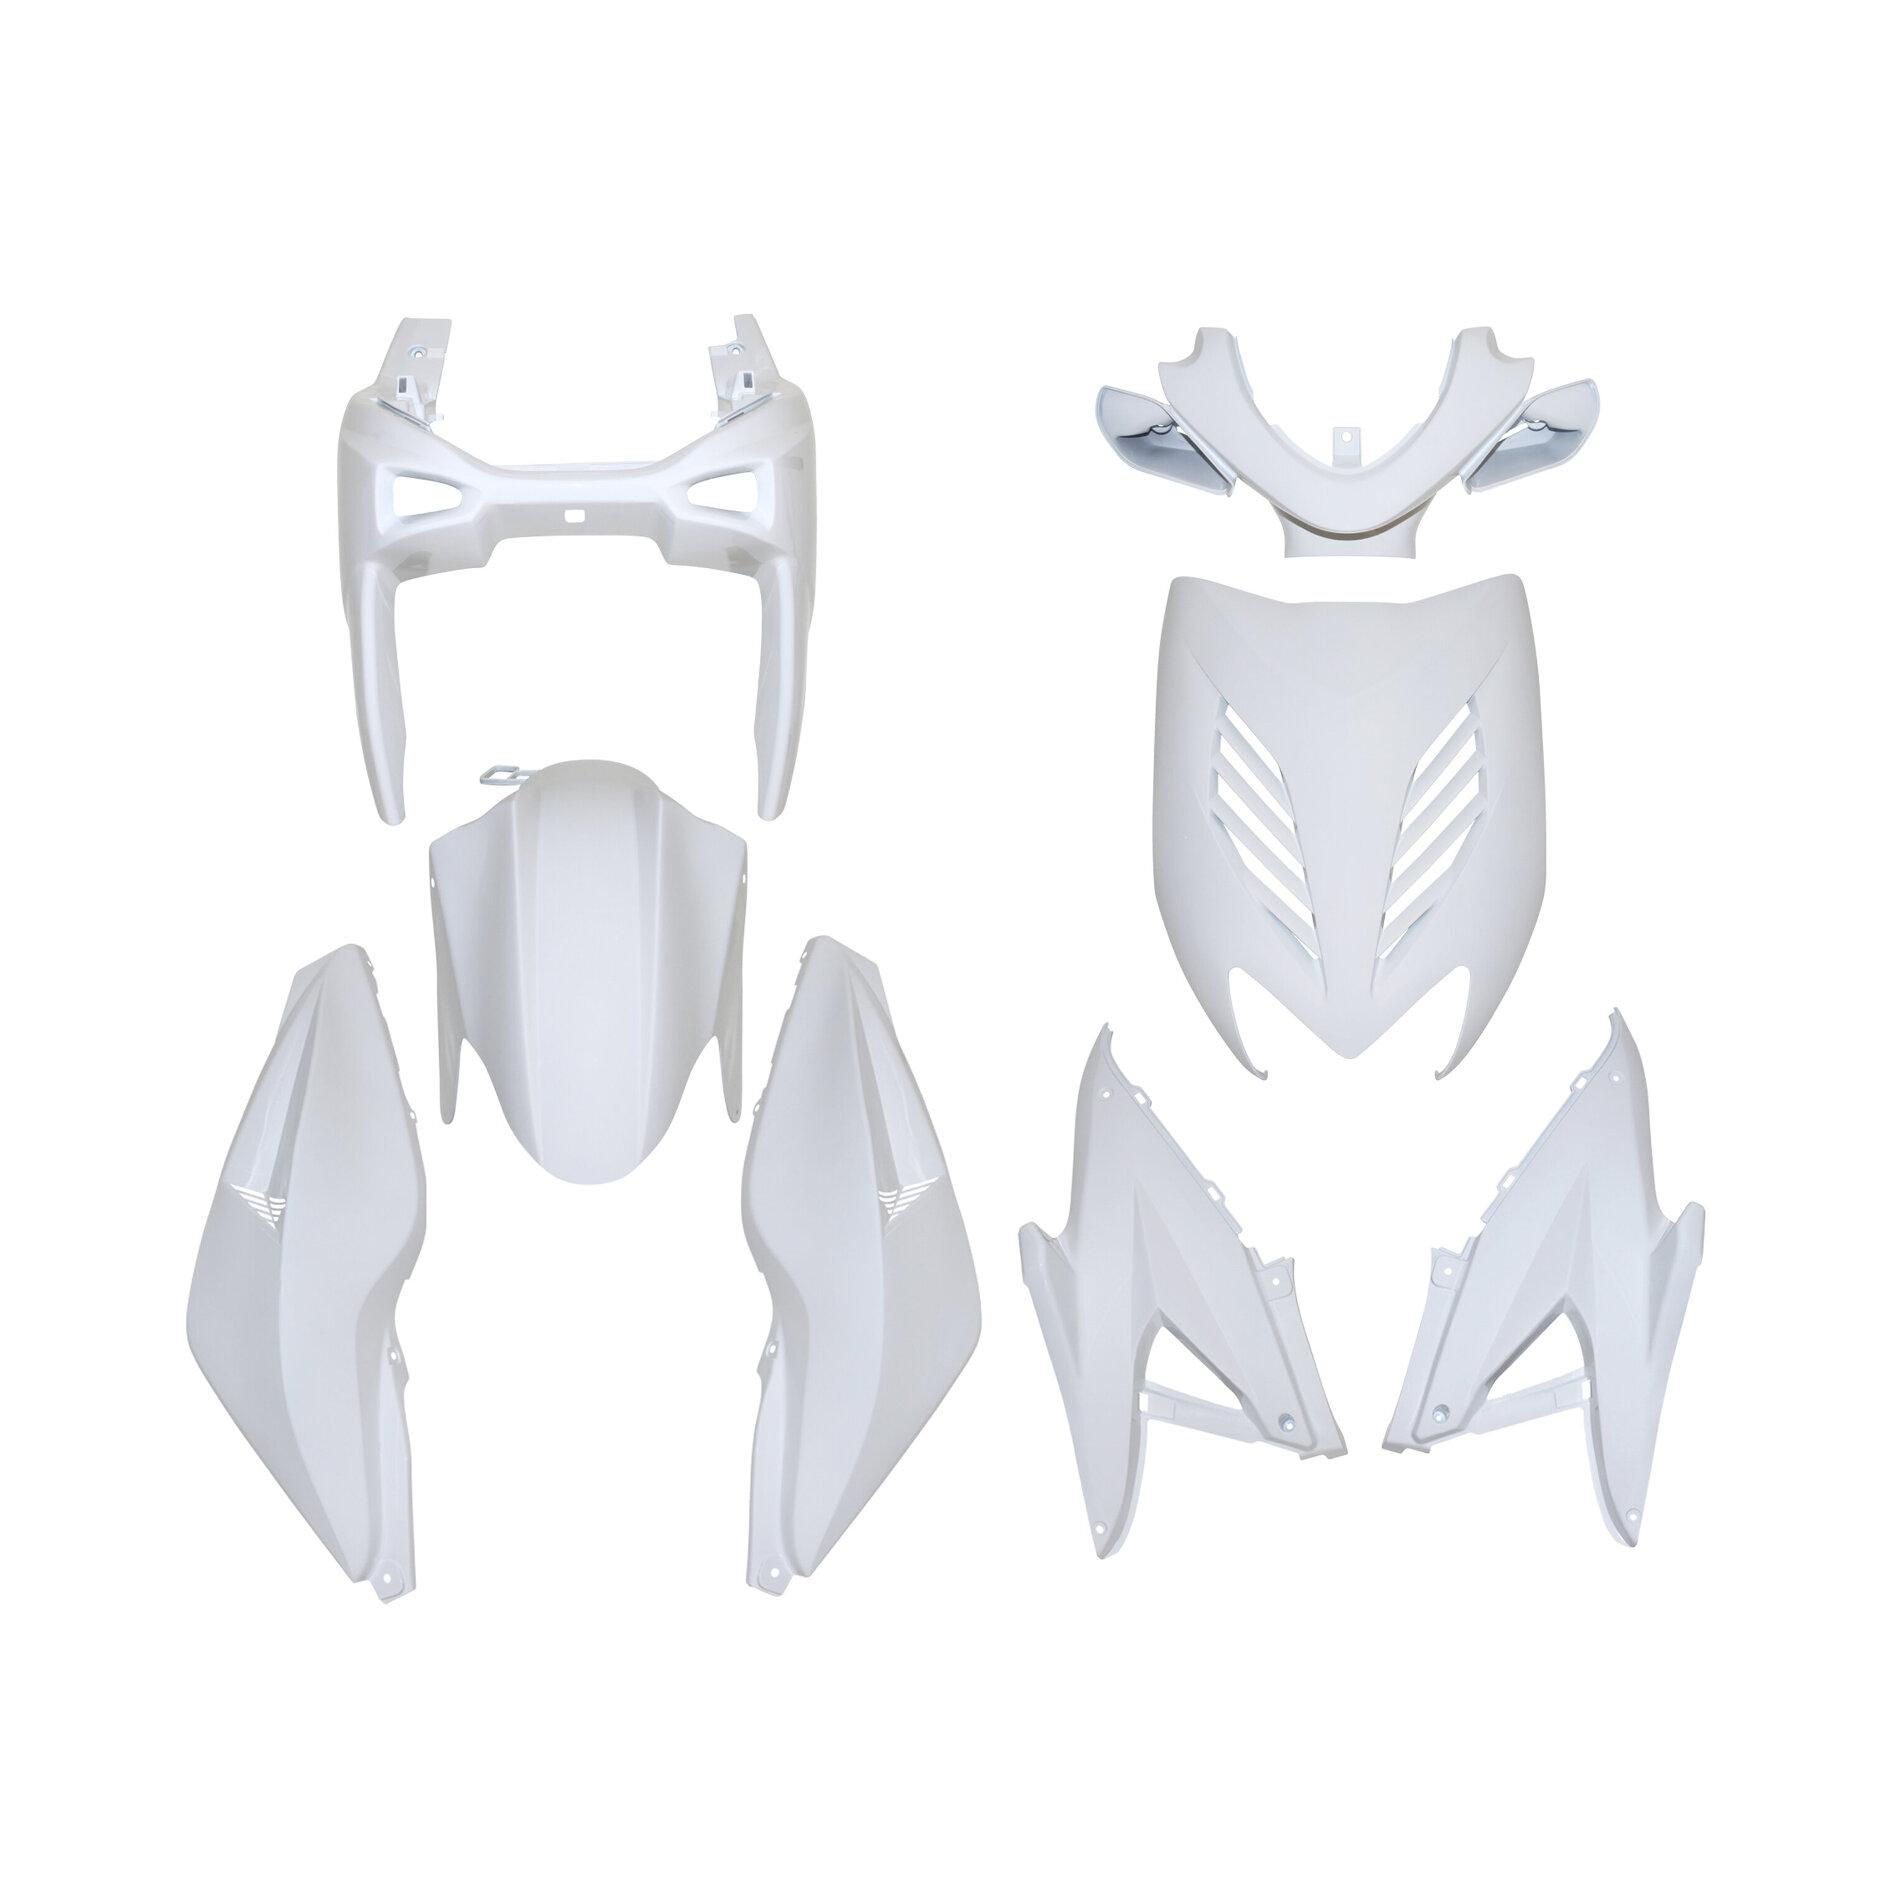 Kit carrosserie 8 pièces blanc brillant adaptable Nitro/Aerox